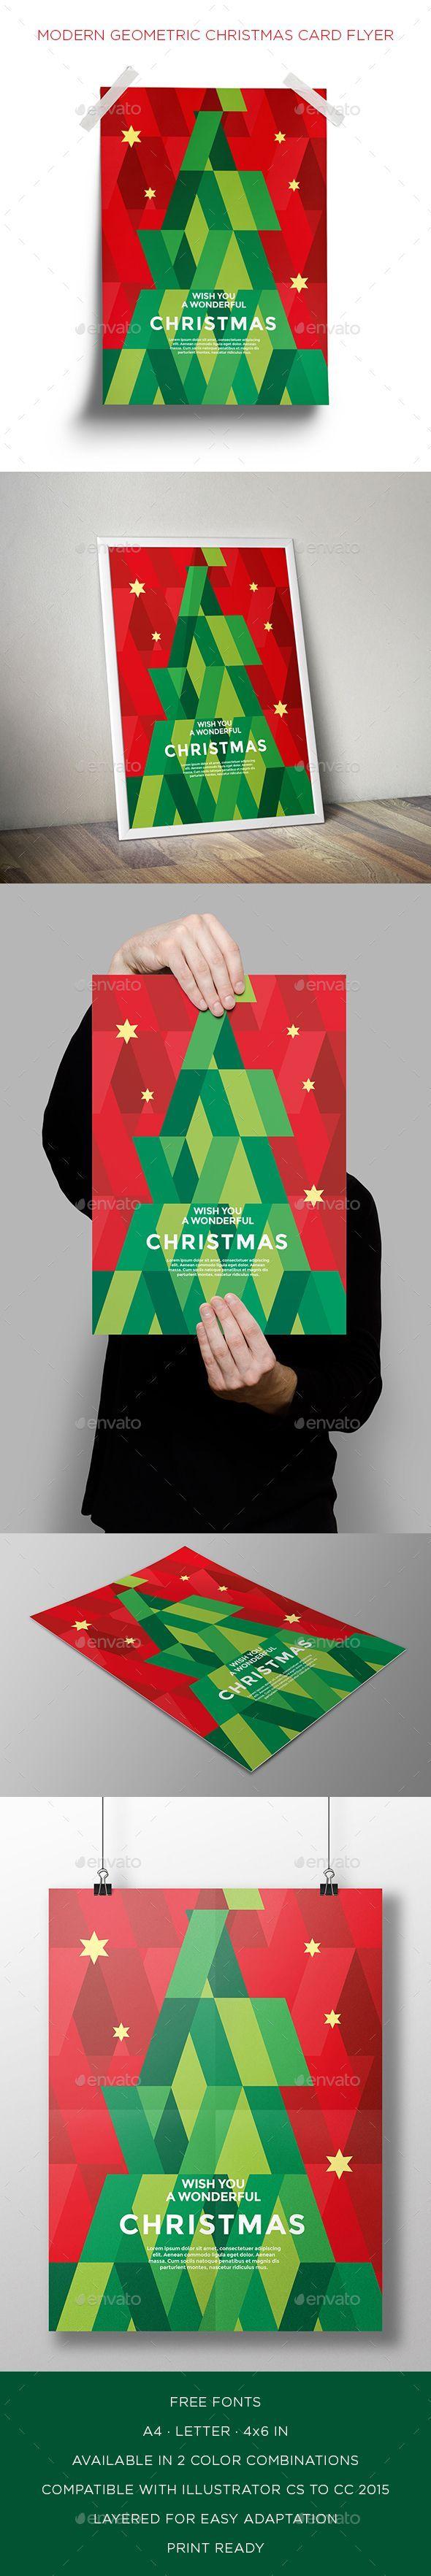 free ecard christmas party invitations%0A Modern Geometric Christmas Card Flyer